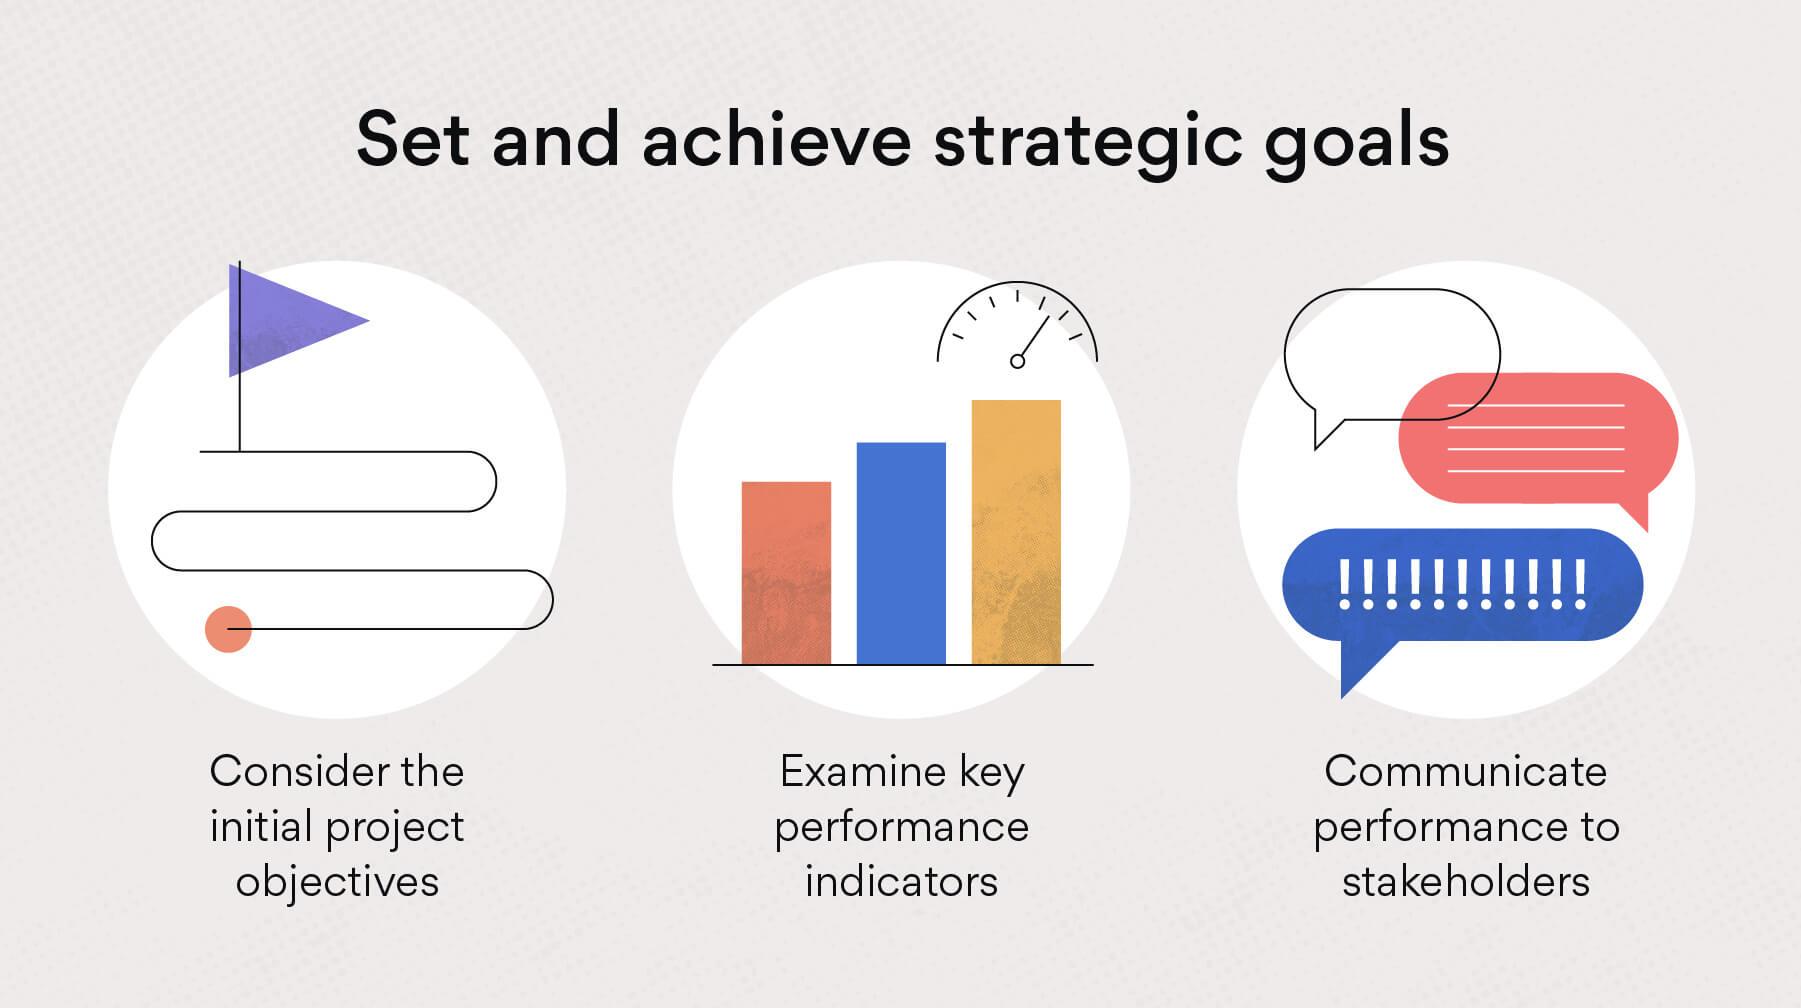 Set and achieve strategic goals